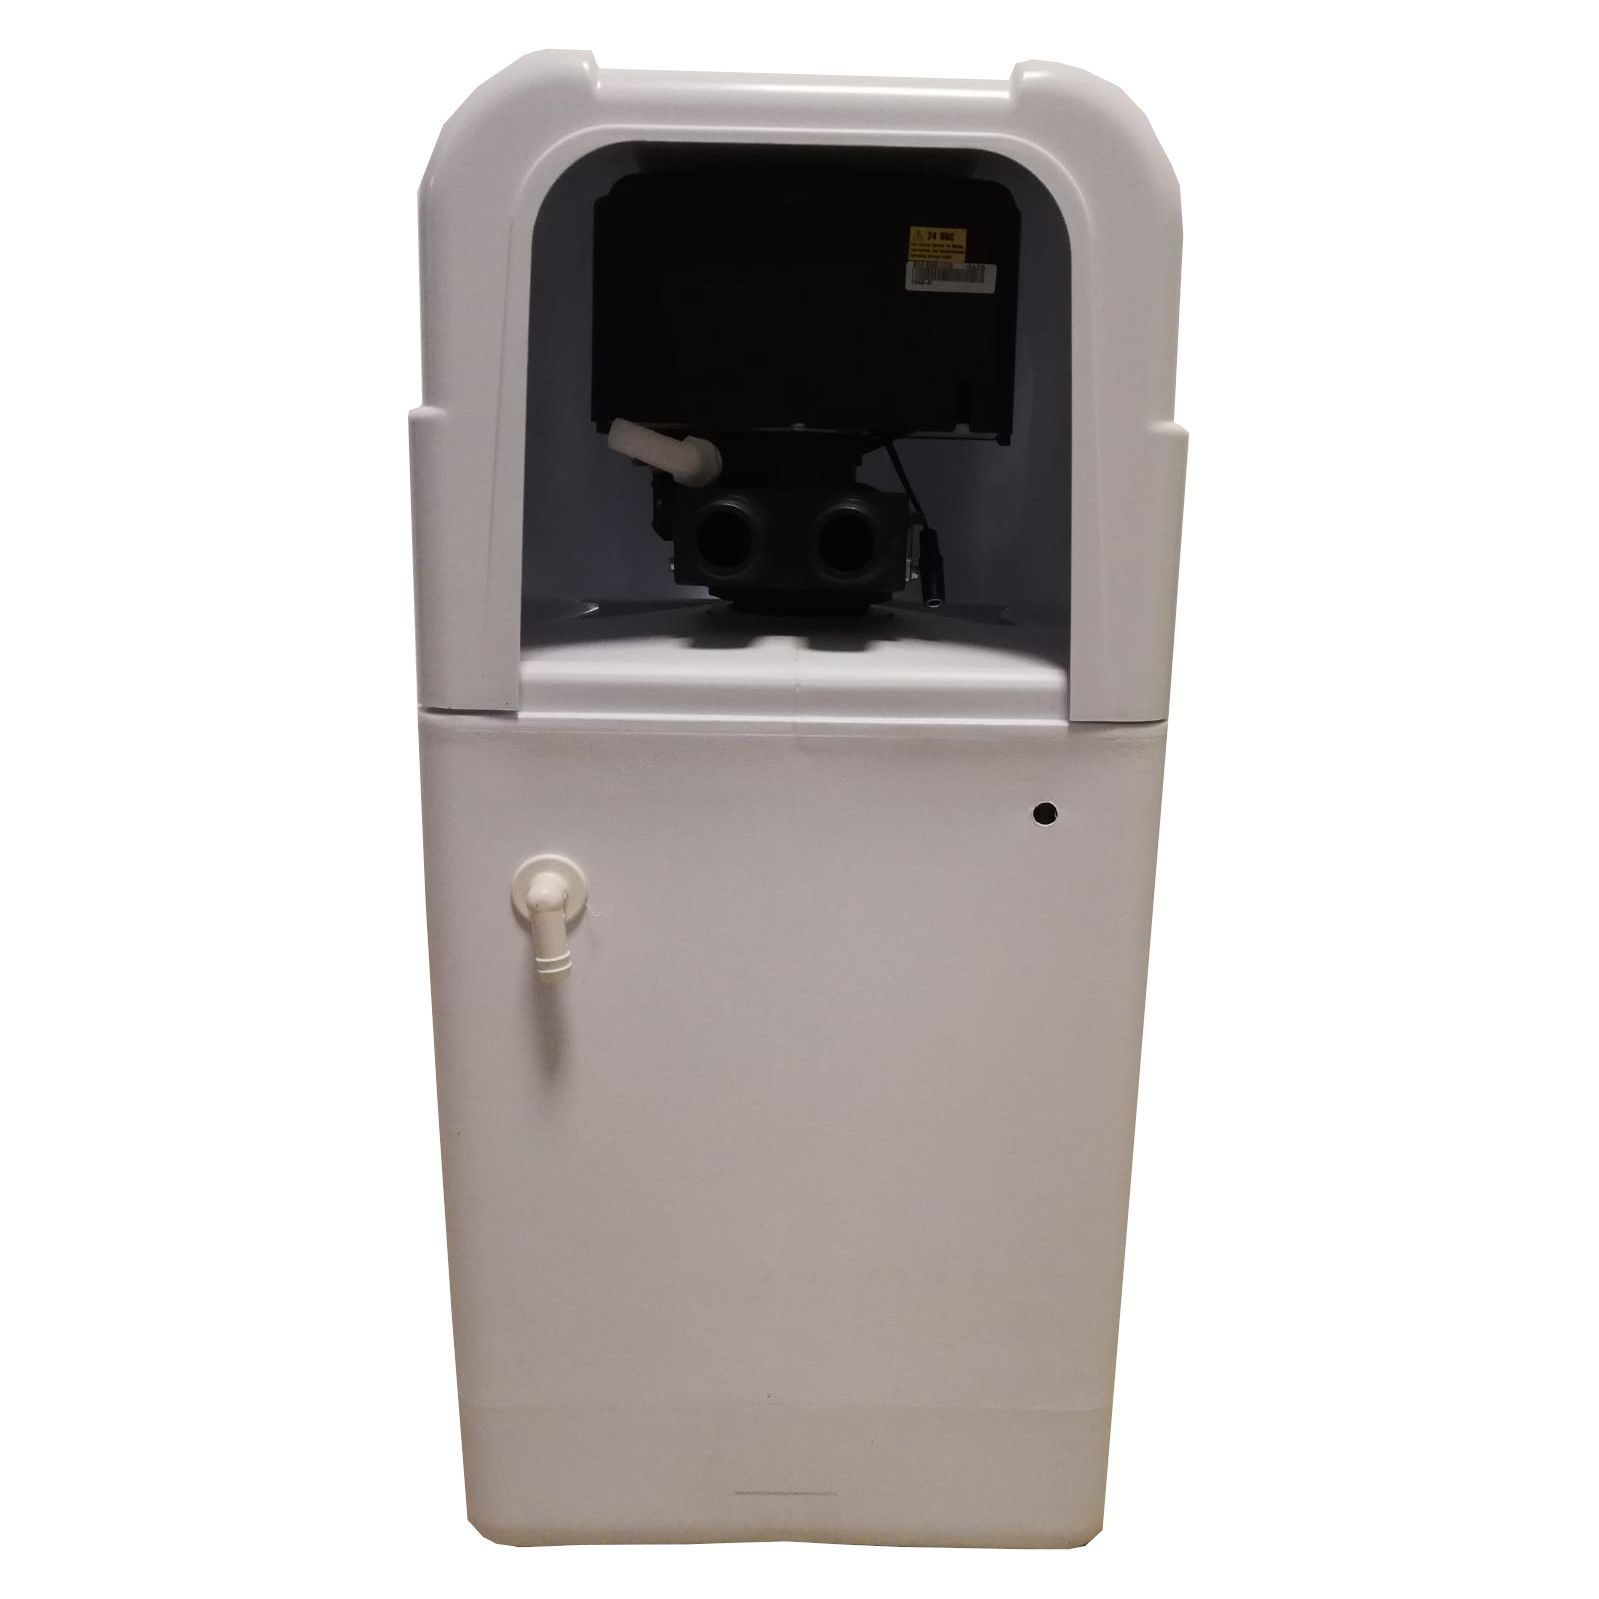 Dedurizator apa Aqua Mini 12-E14M, Debit 0.72 mc/h, Capacitate filtrare 12.400 litri, Cartus din Rasina Cationica - AquaFilters.ro